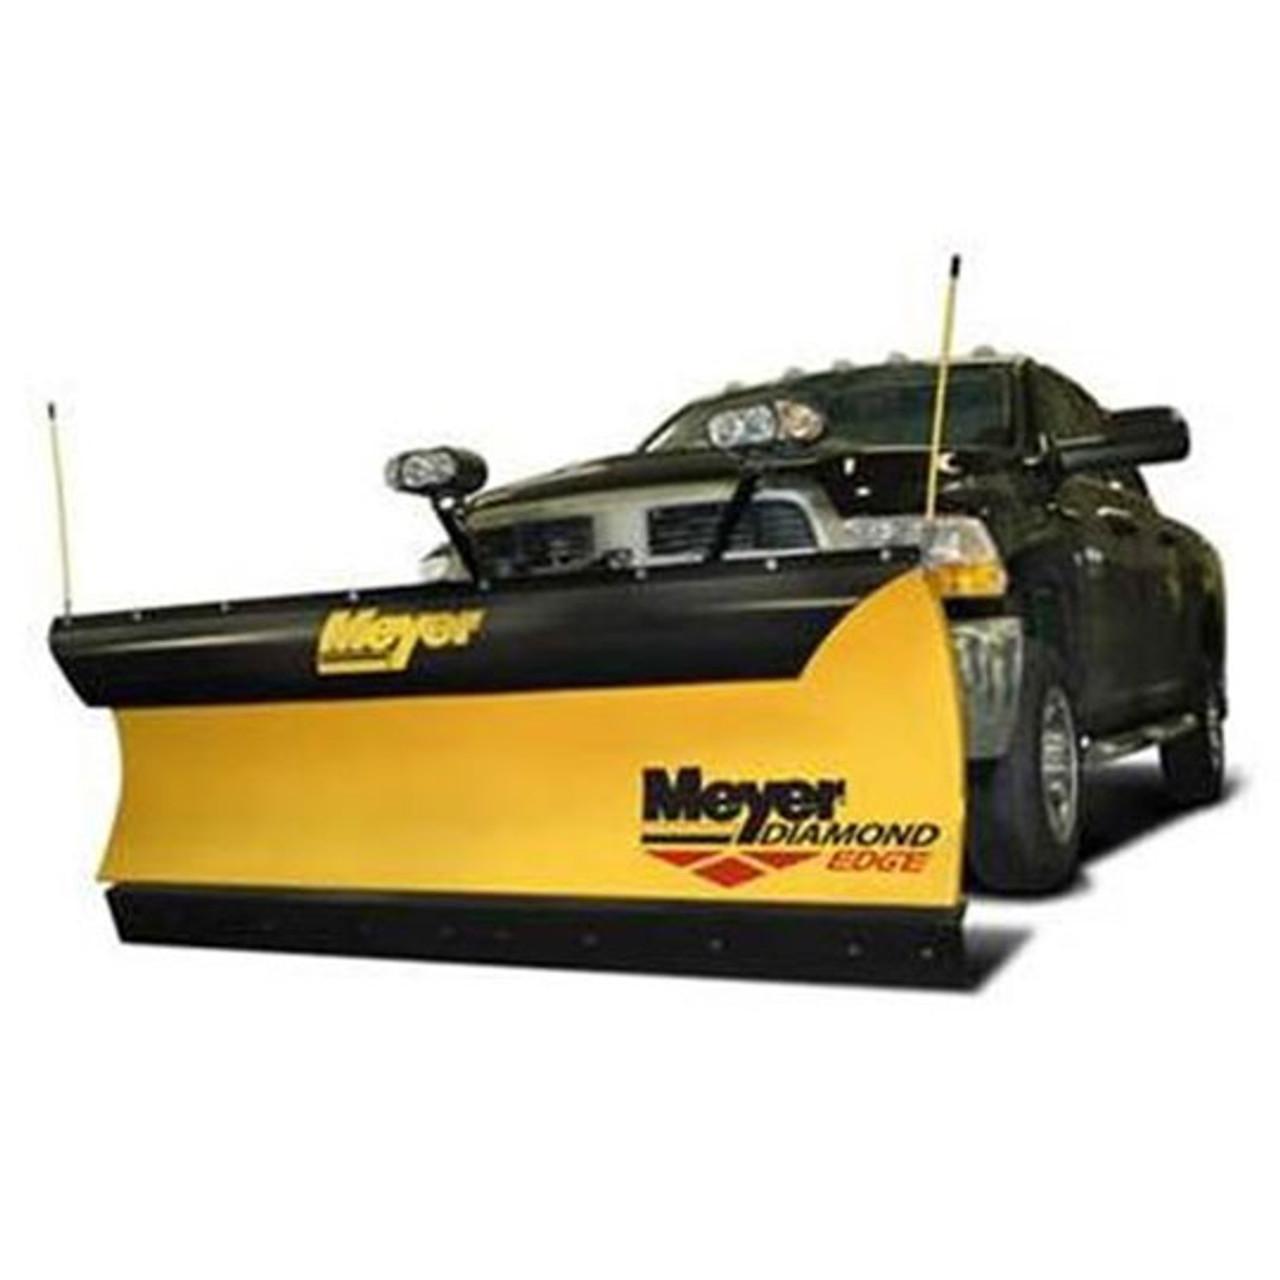 Meyer Diamond Edge Plow Blade DE-8 0 - Holmes Rental Station